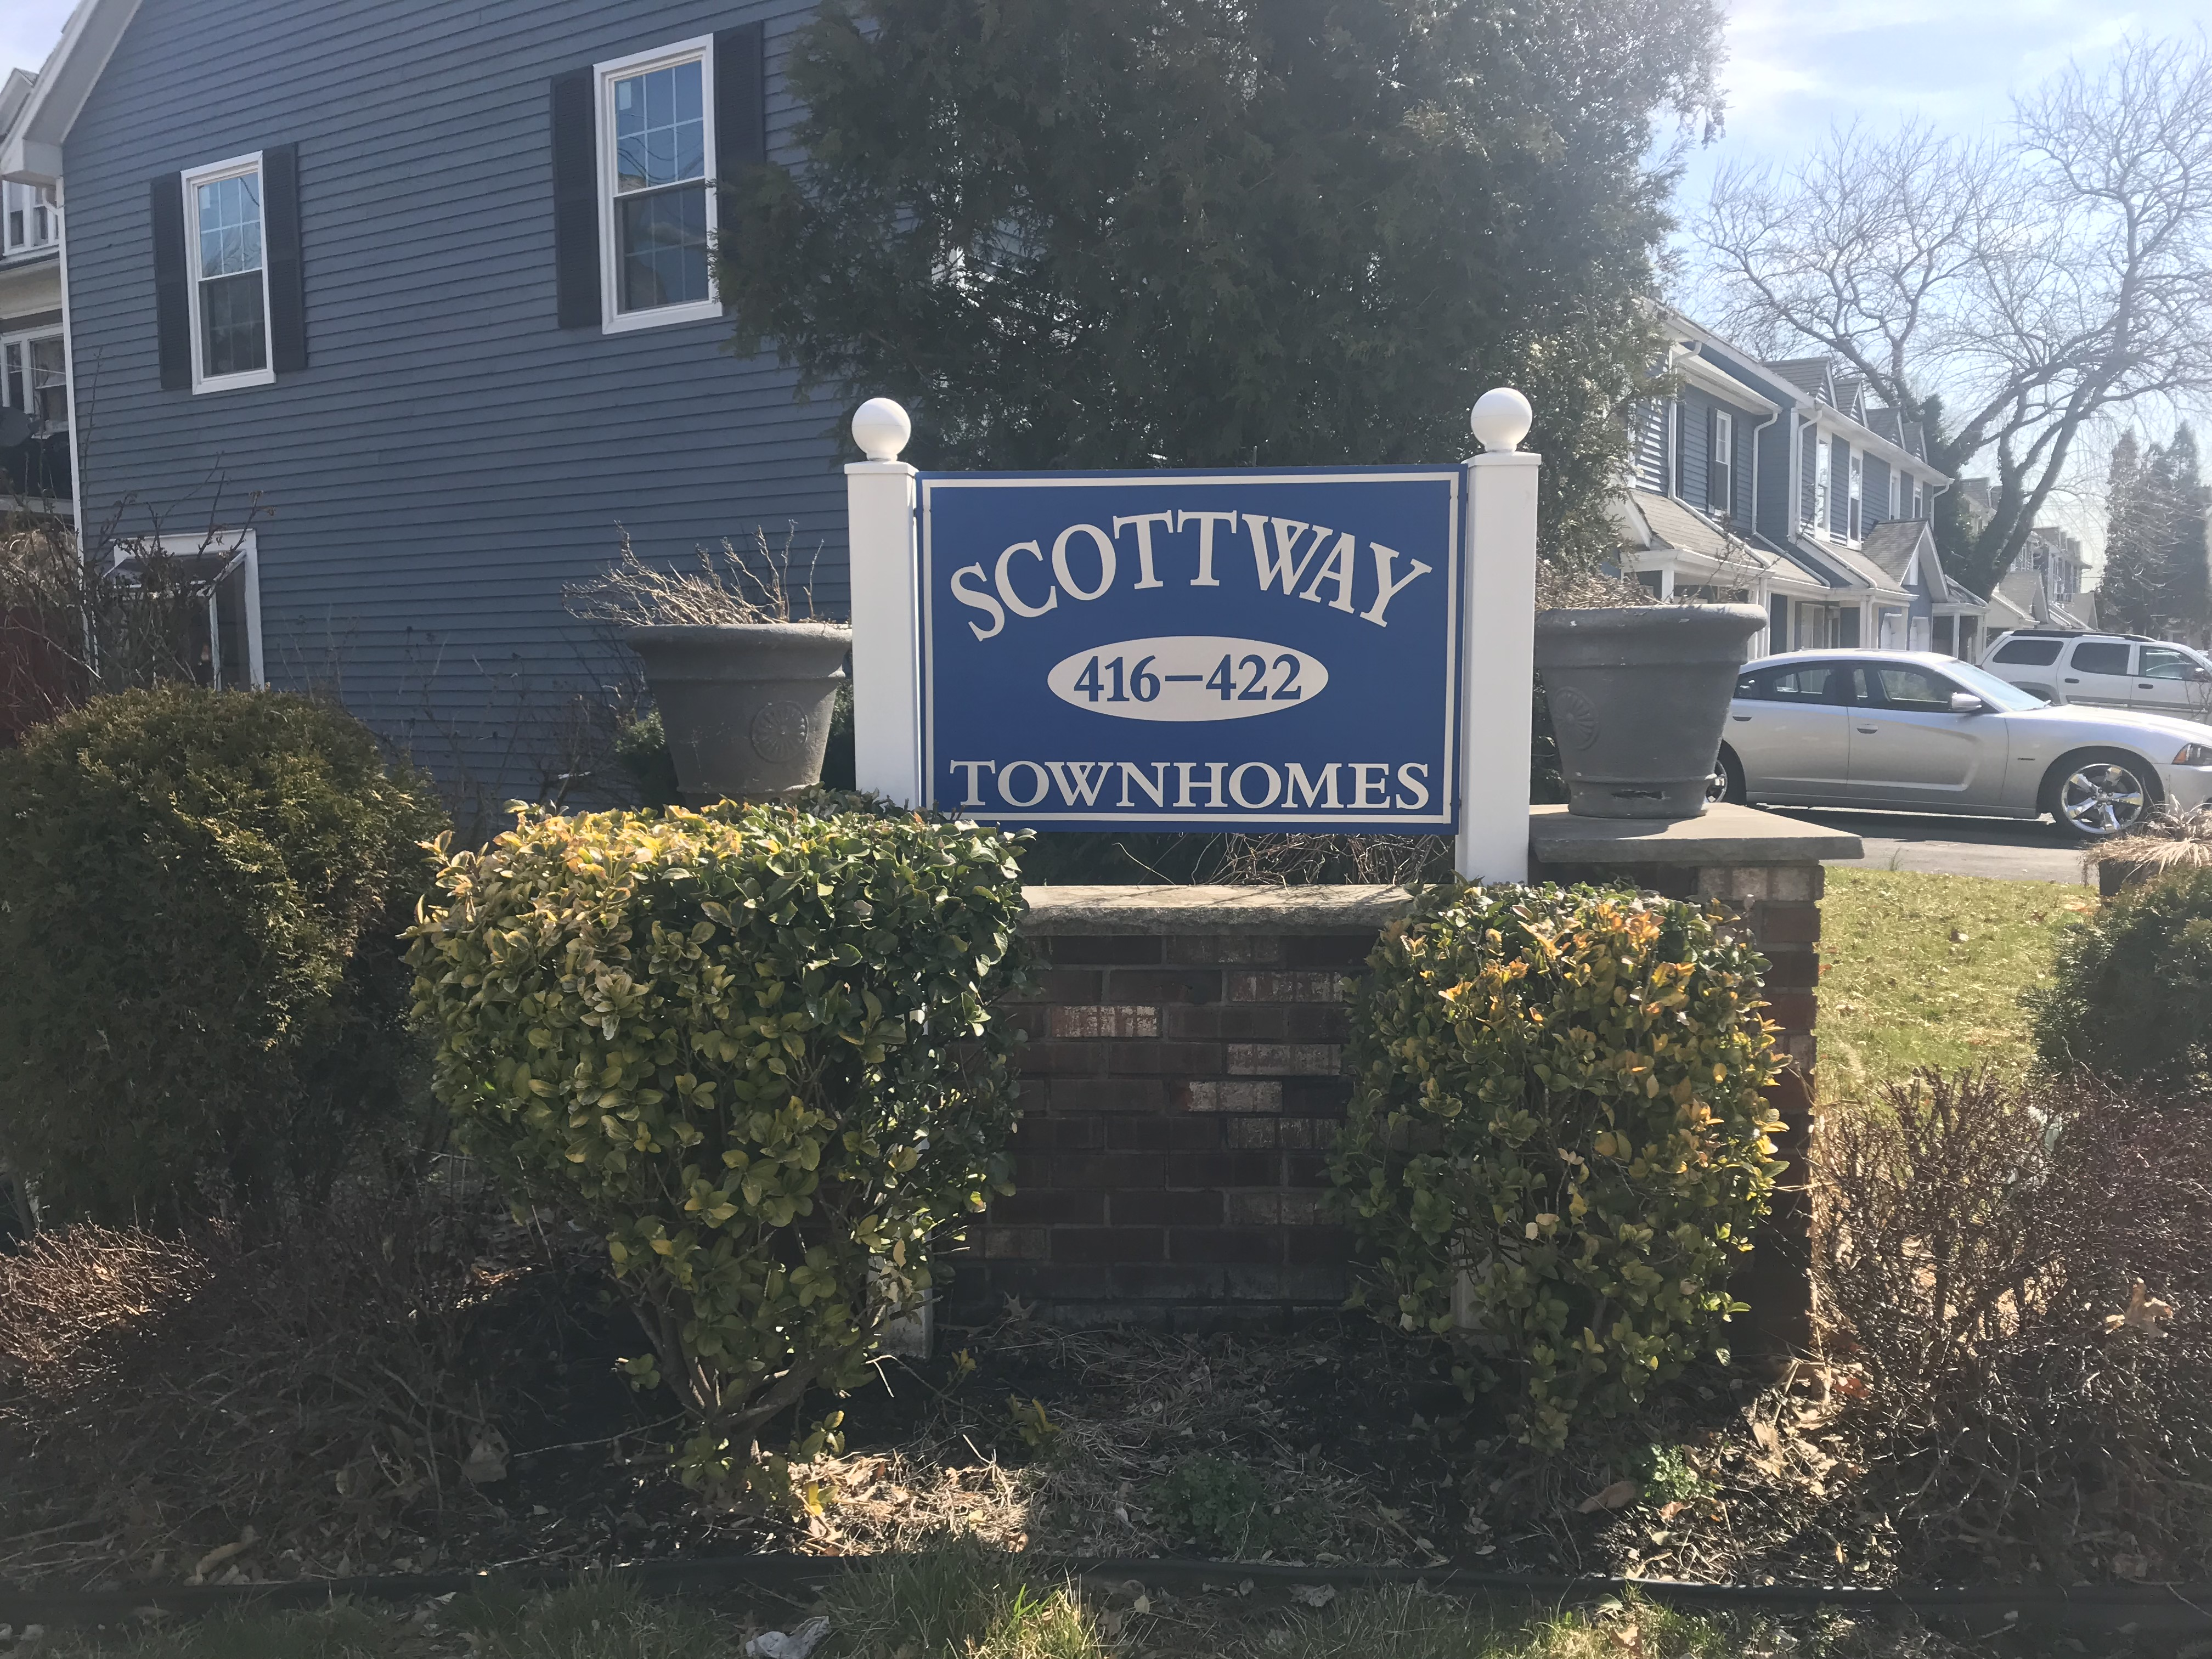 Scottway Condos Plainfield New Jersey